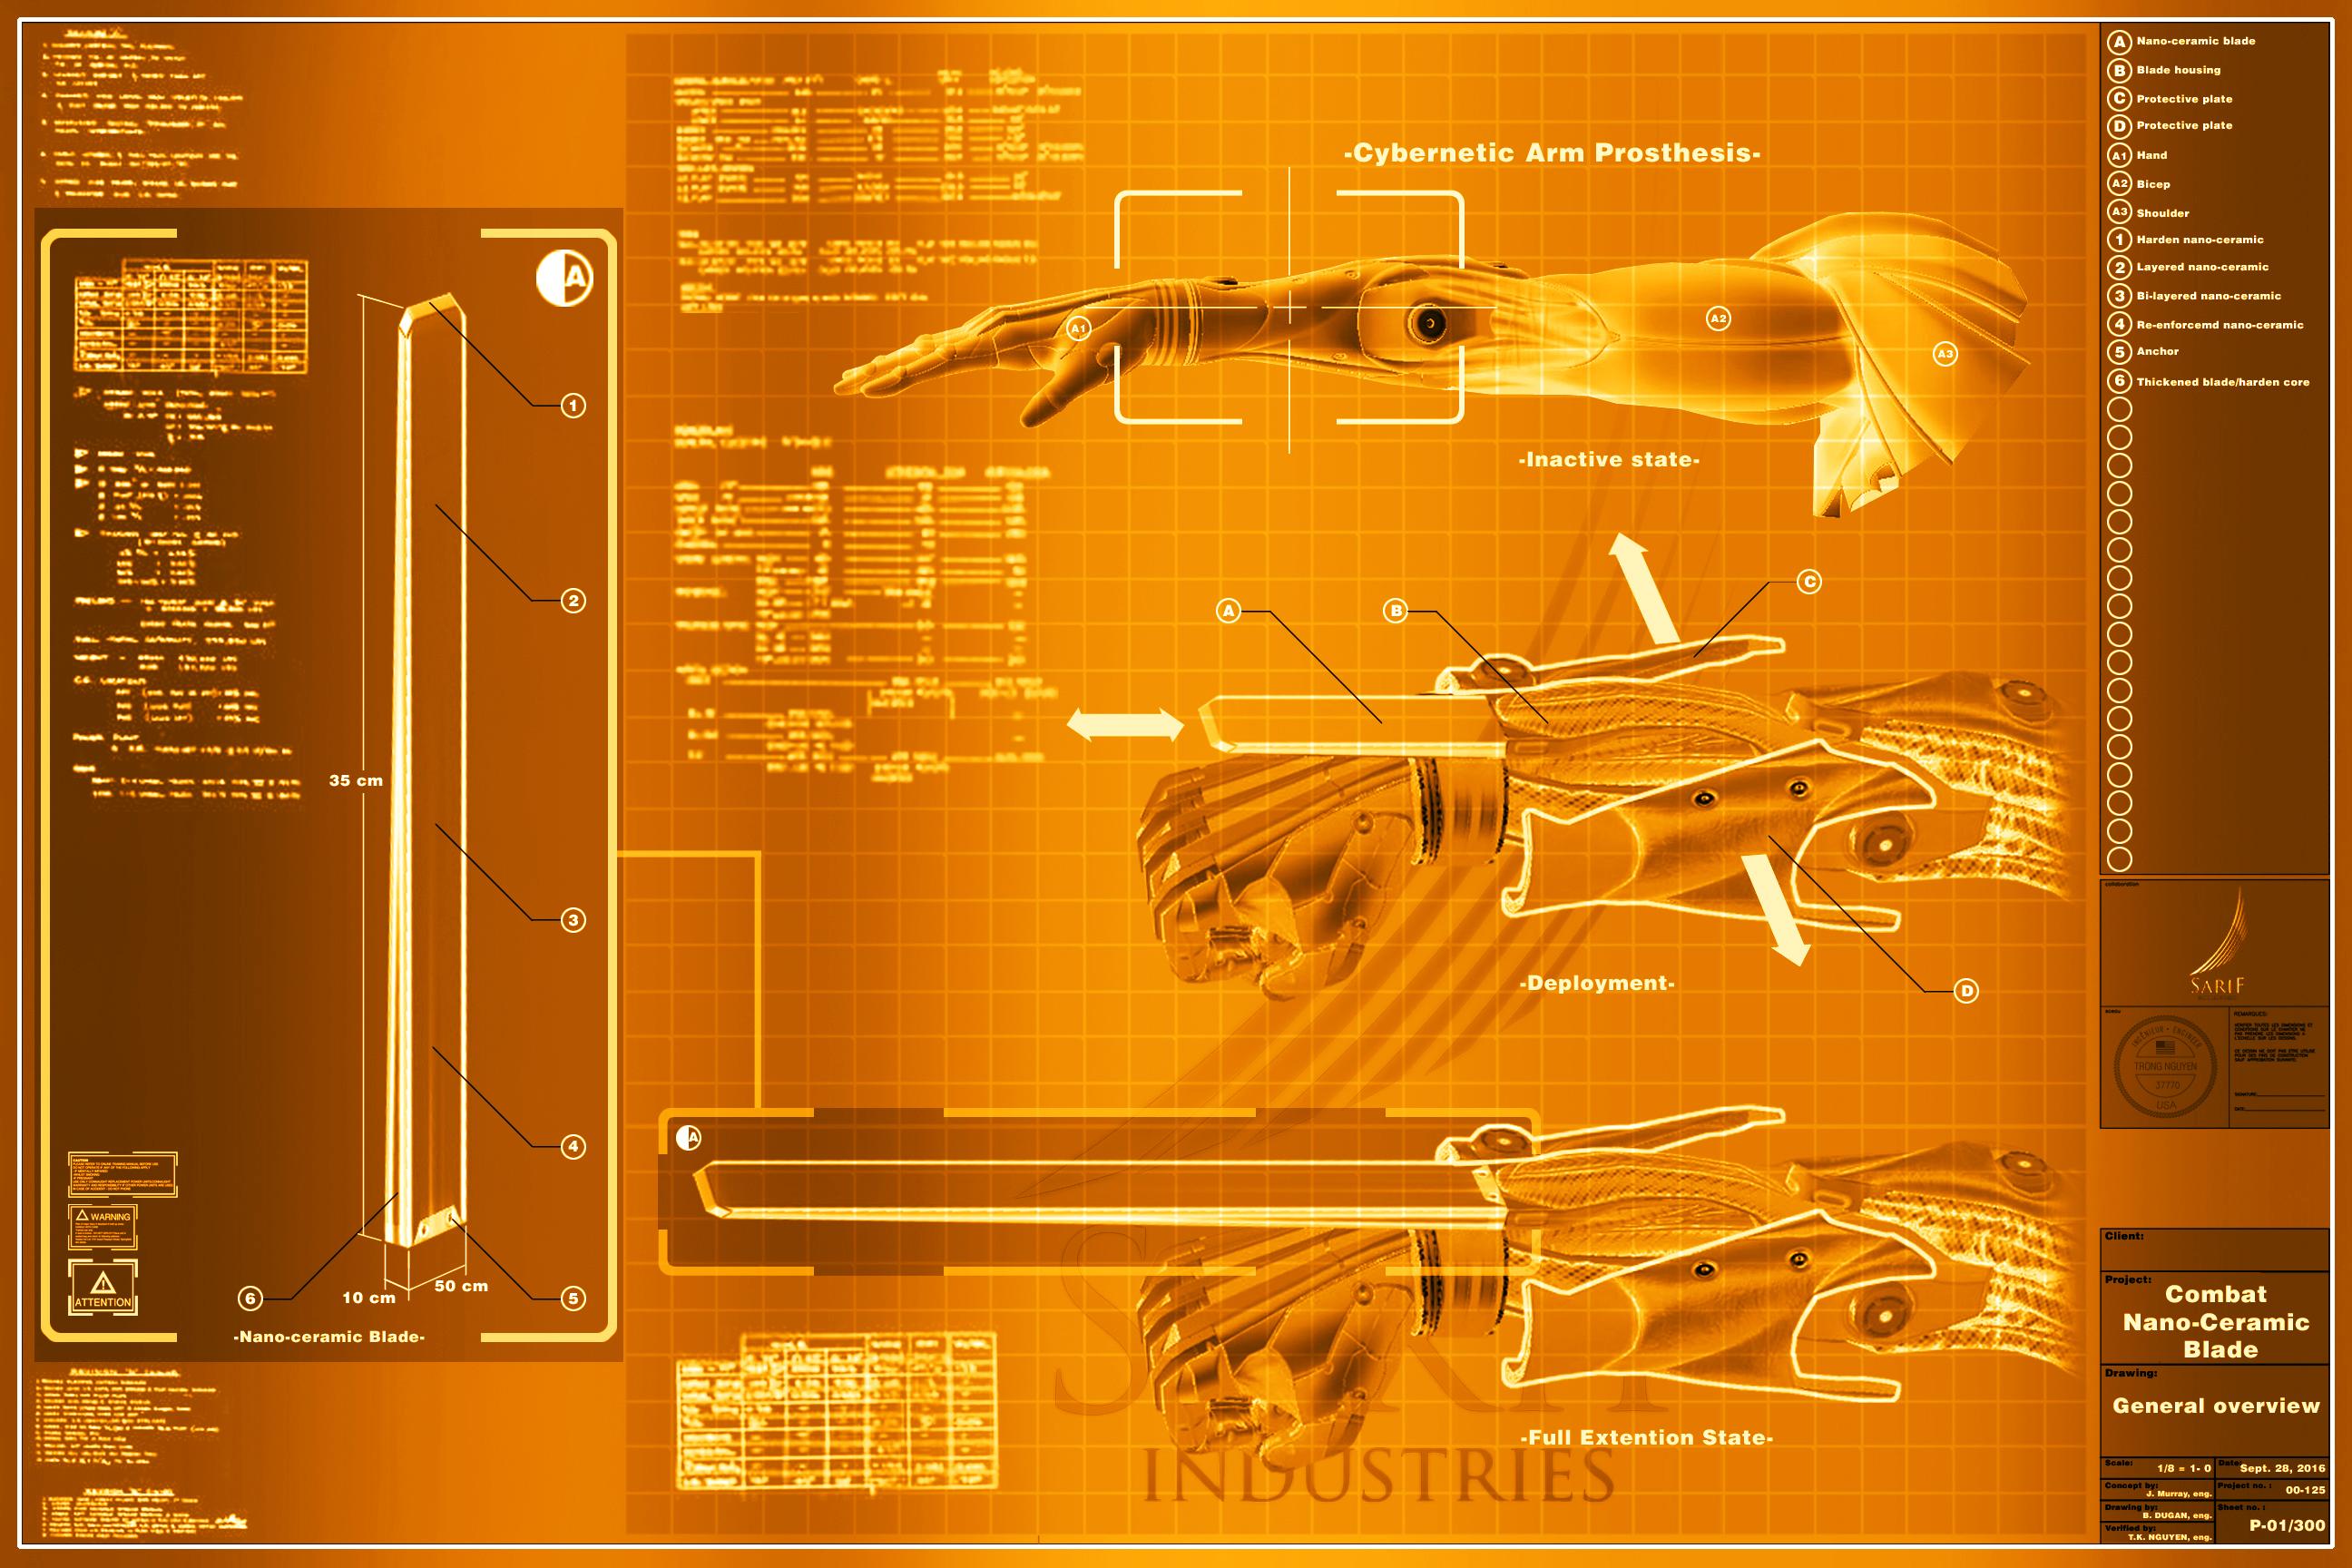 Image aug blueprint 2g deus ex wiki fandom powered by wikia aug blueprint 2g malvernweather Image collections